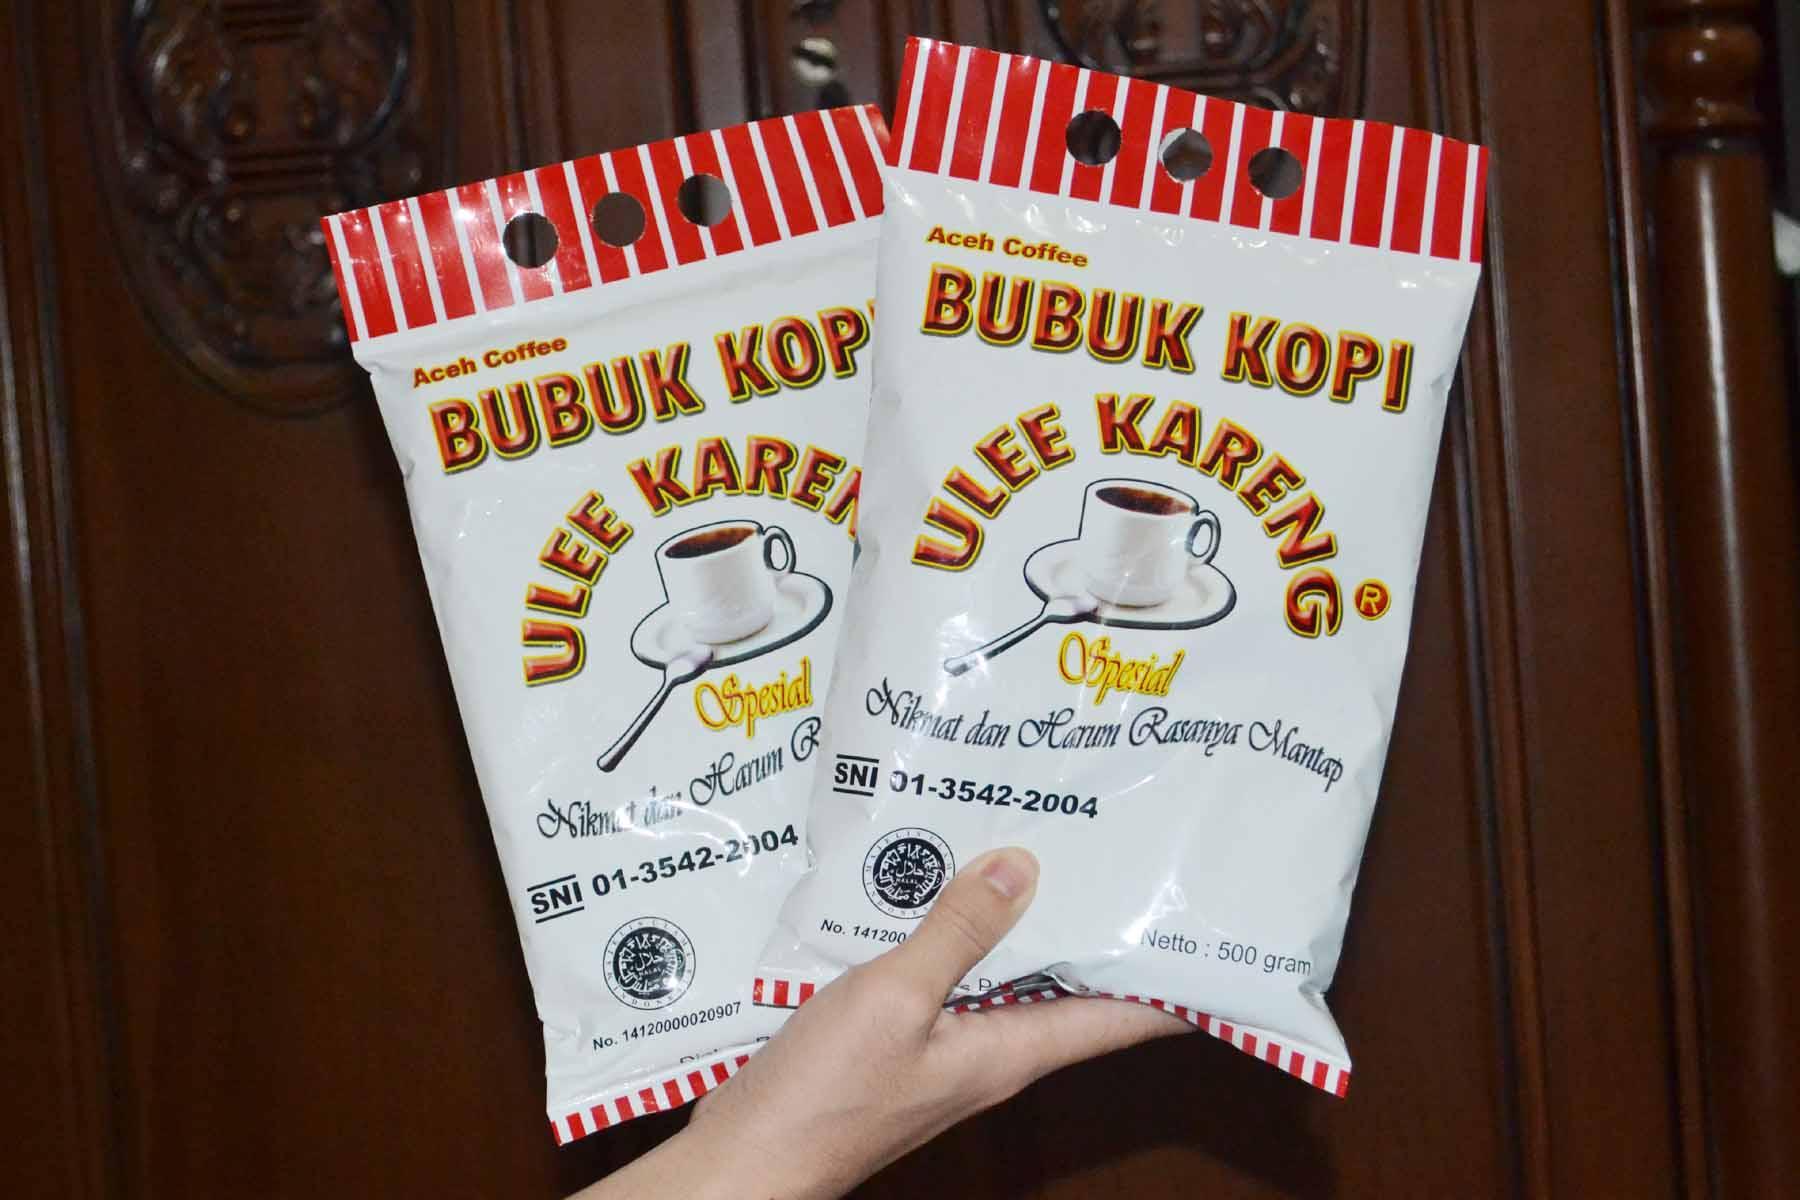 Beli Fry And Roast Kopi Toraja Blend Gold 250 Gram Bubuk Halus Biji Jantan Warung Tinggi Premium Blended Coffee Ulee Kareng Spesial 500